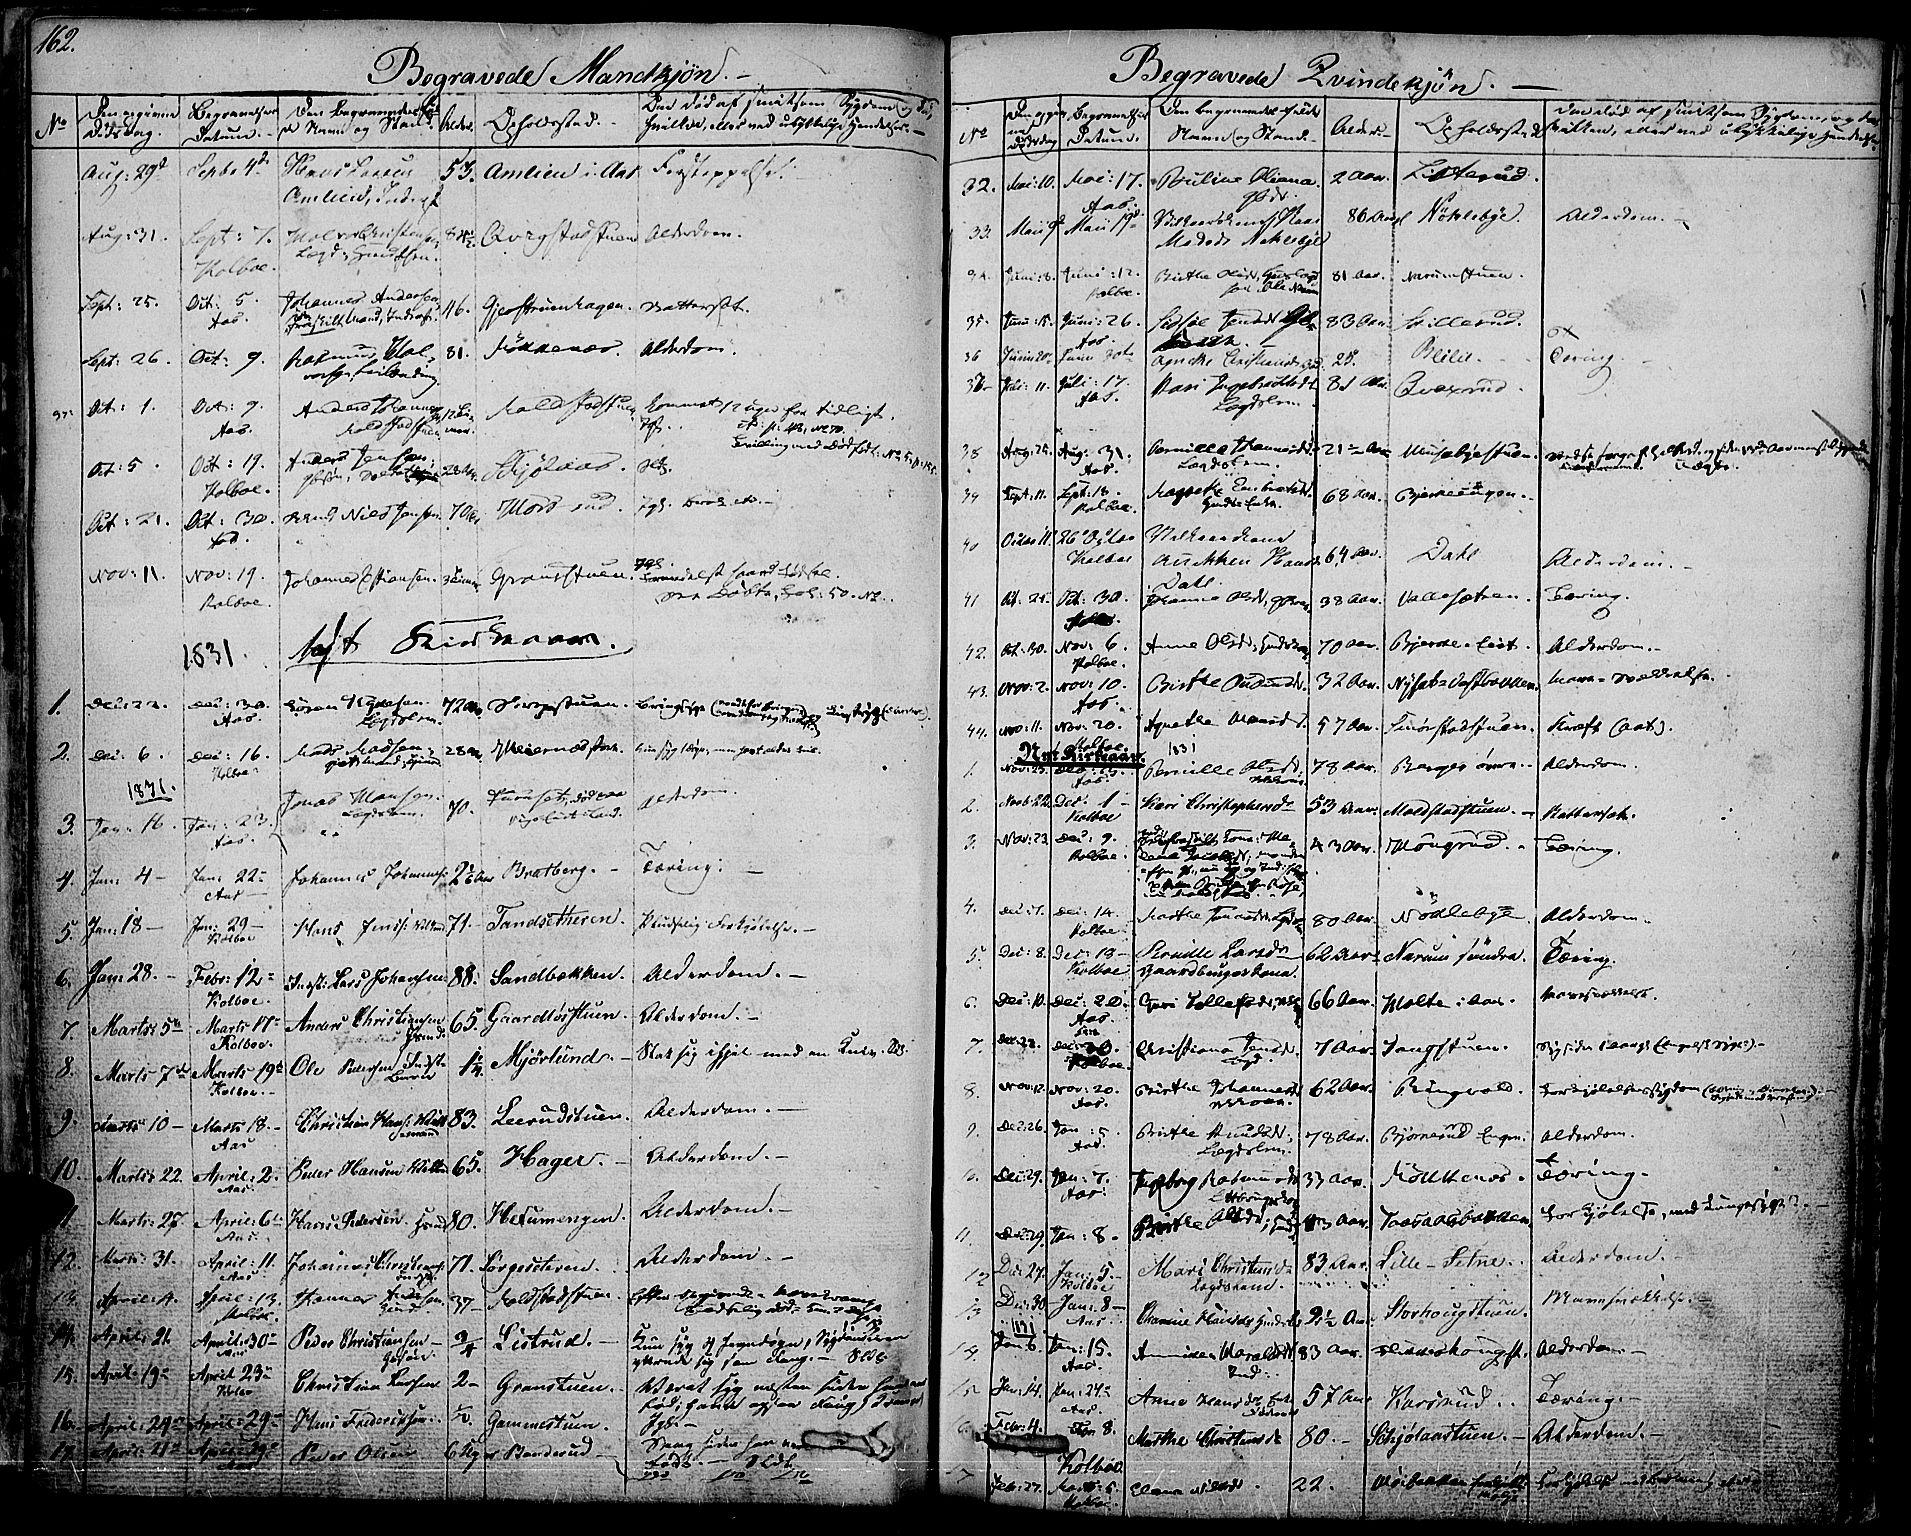 SAH, Vestre Toten prestekontor, H/Ha/Haa/L0002: Ministerialbok nr. 2, 1825-1837, s. 162